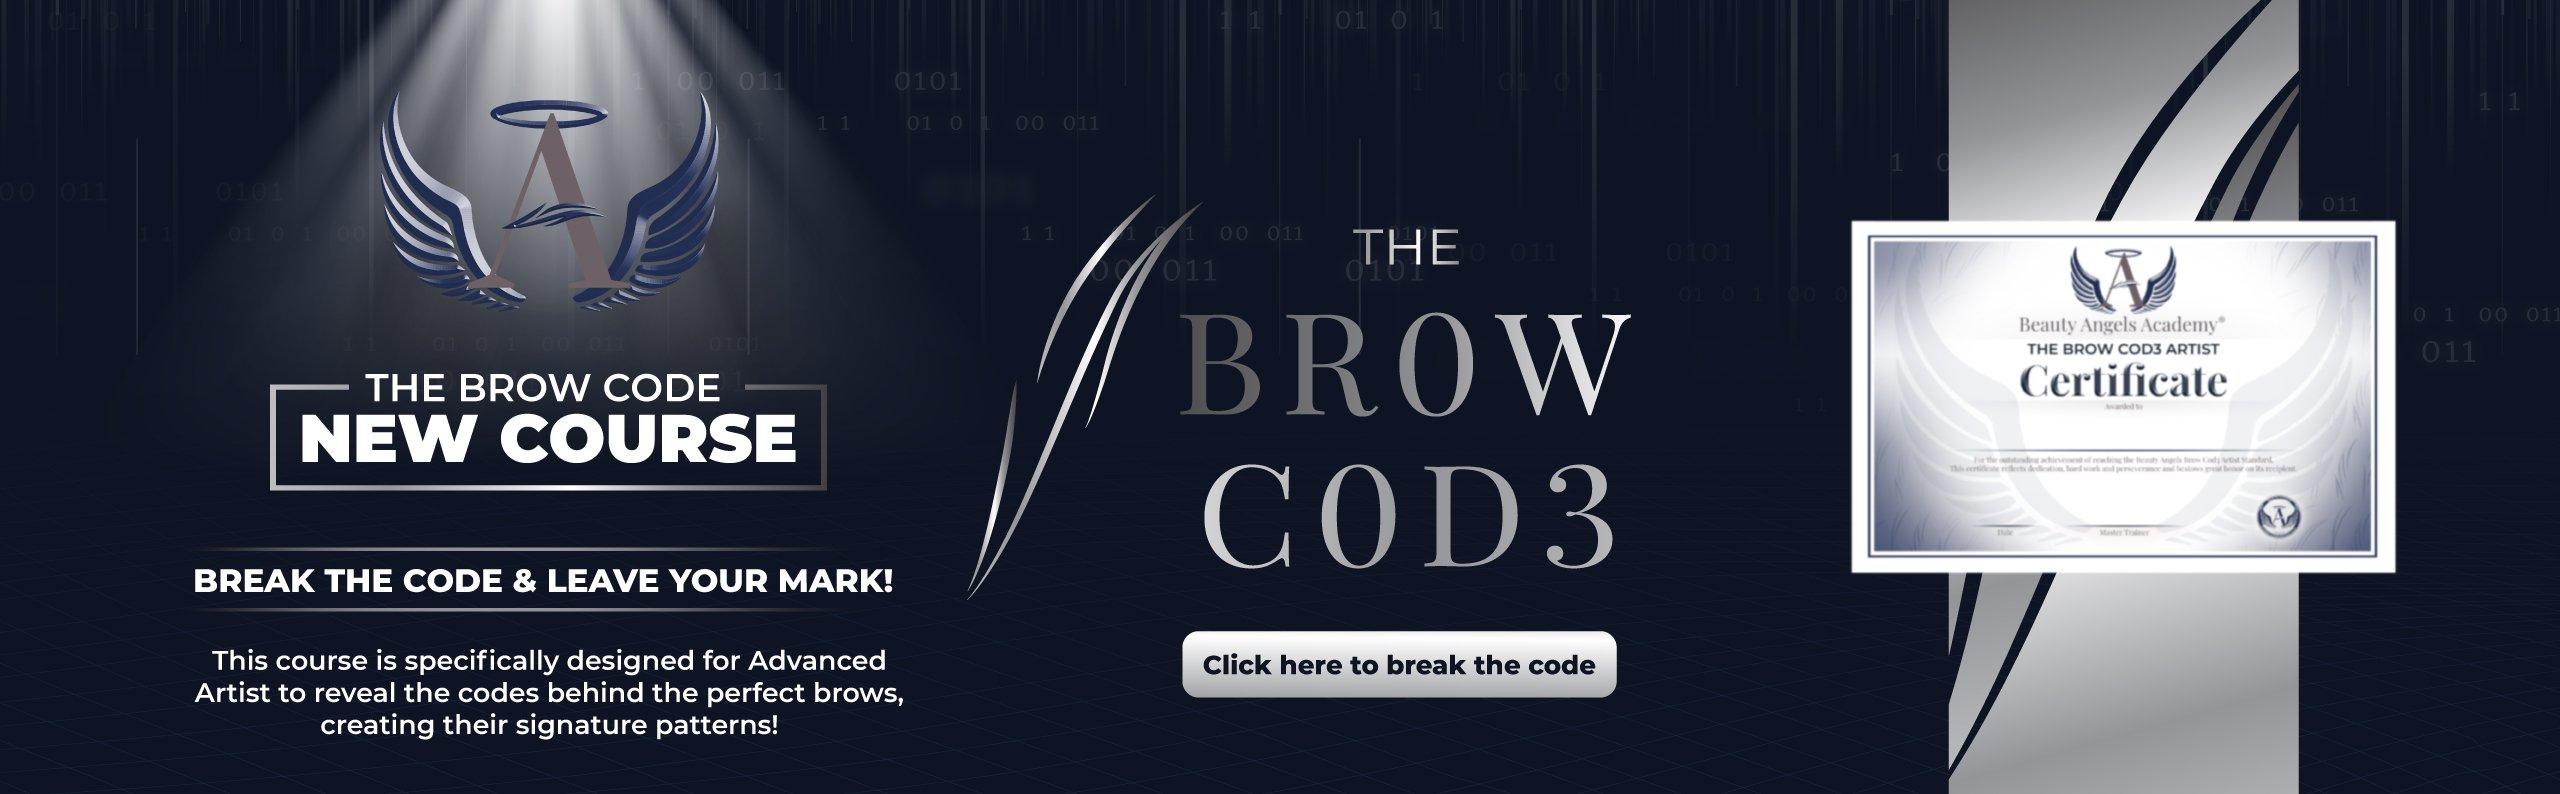 Brow-Code-Banner